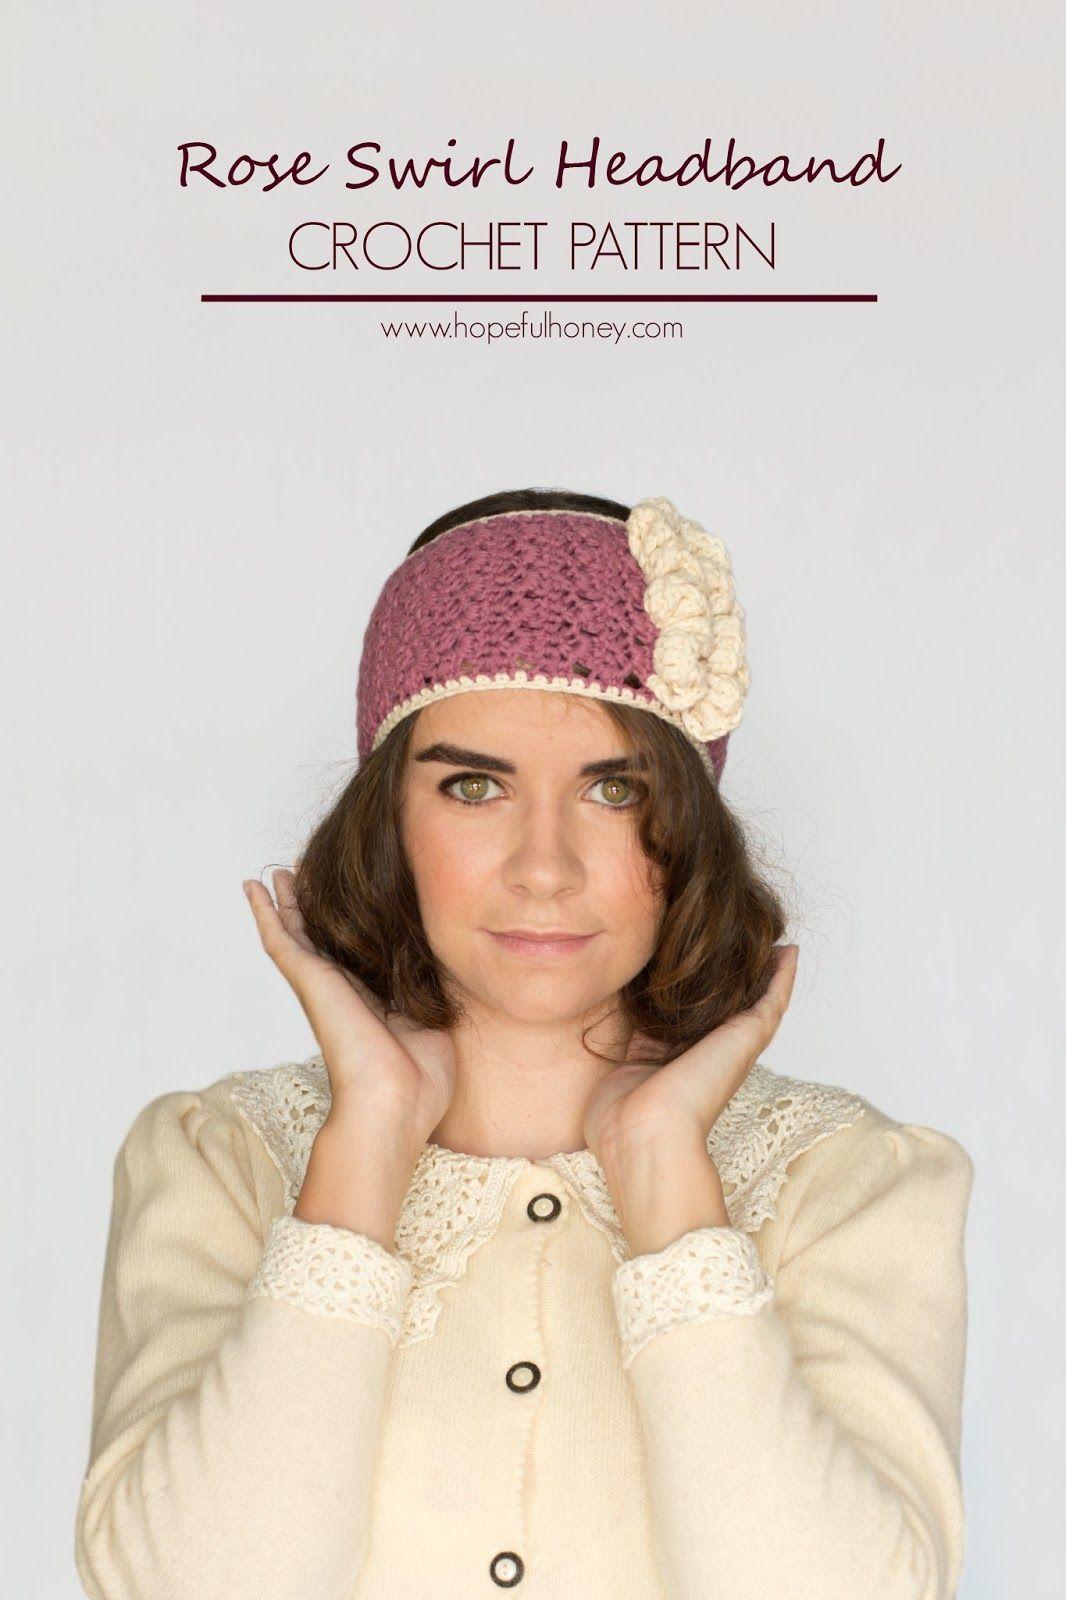 Hopeful Honey | Craft, Crochet, Create: 1920\'s Rose Swirl Headband ...